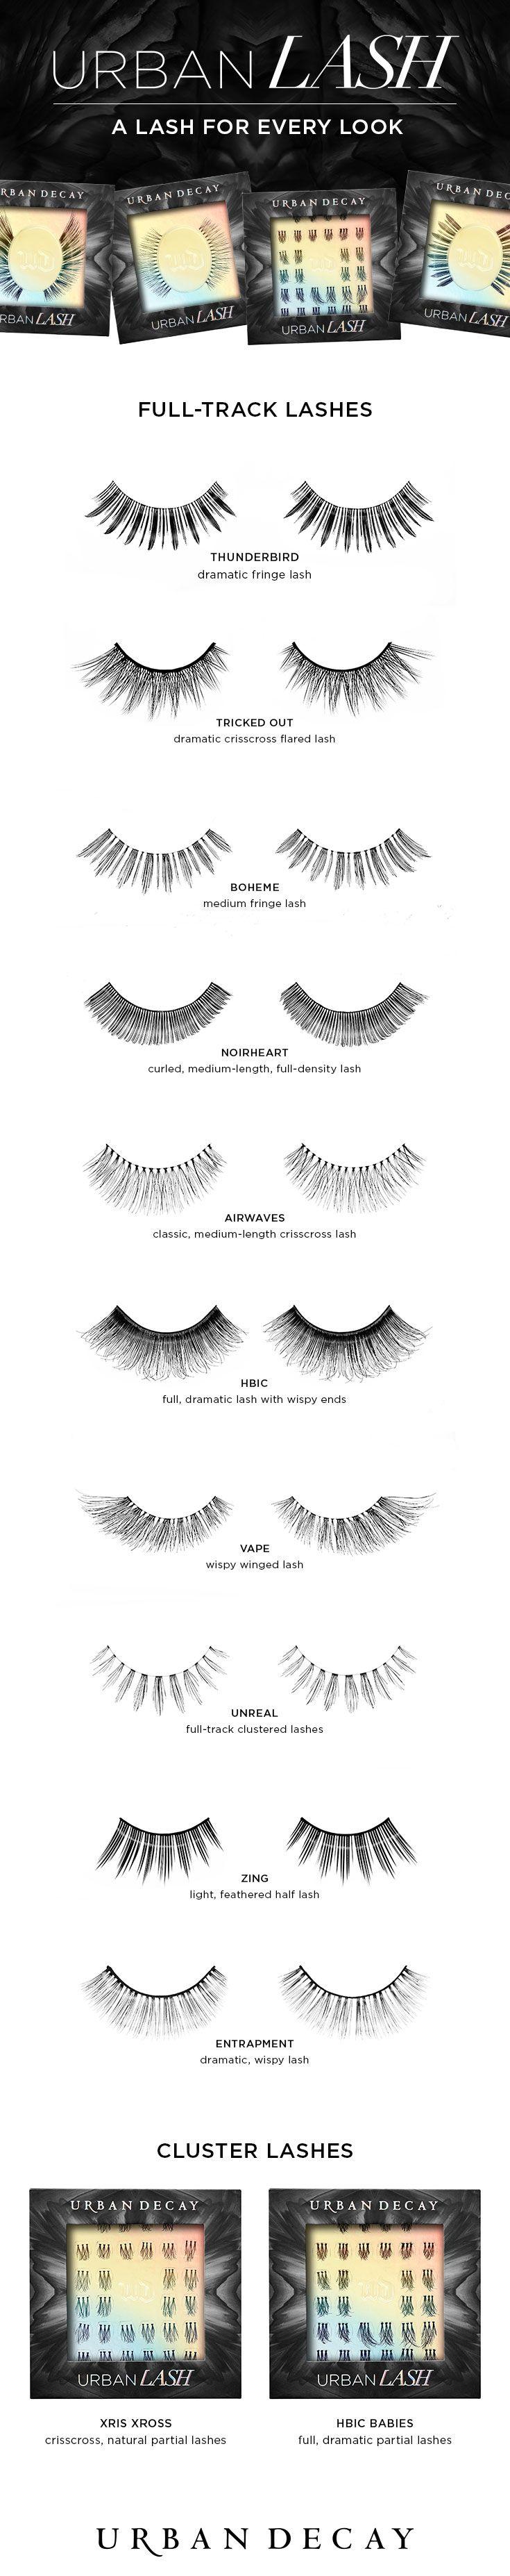 7a32e03ca45 Urban Lash False Eyelashes | eye lashes | Pestañas postizas, Pestañas,  Tatuajes falsos